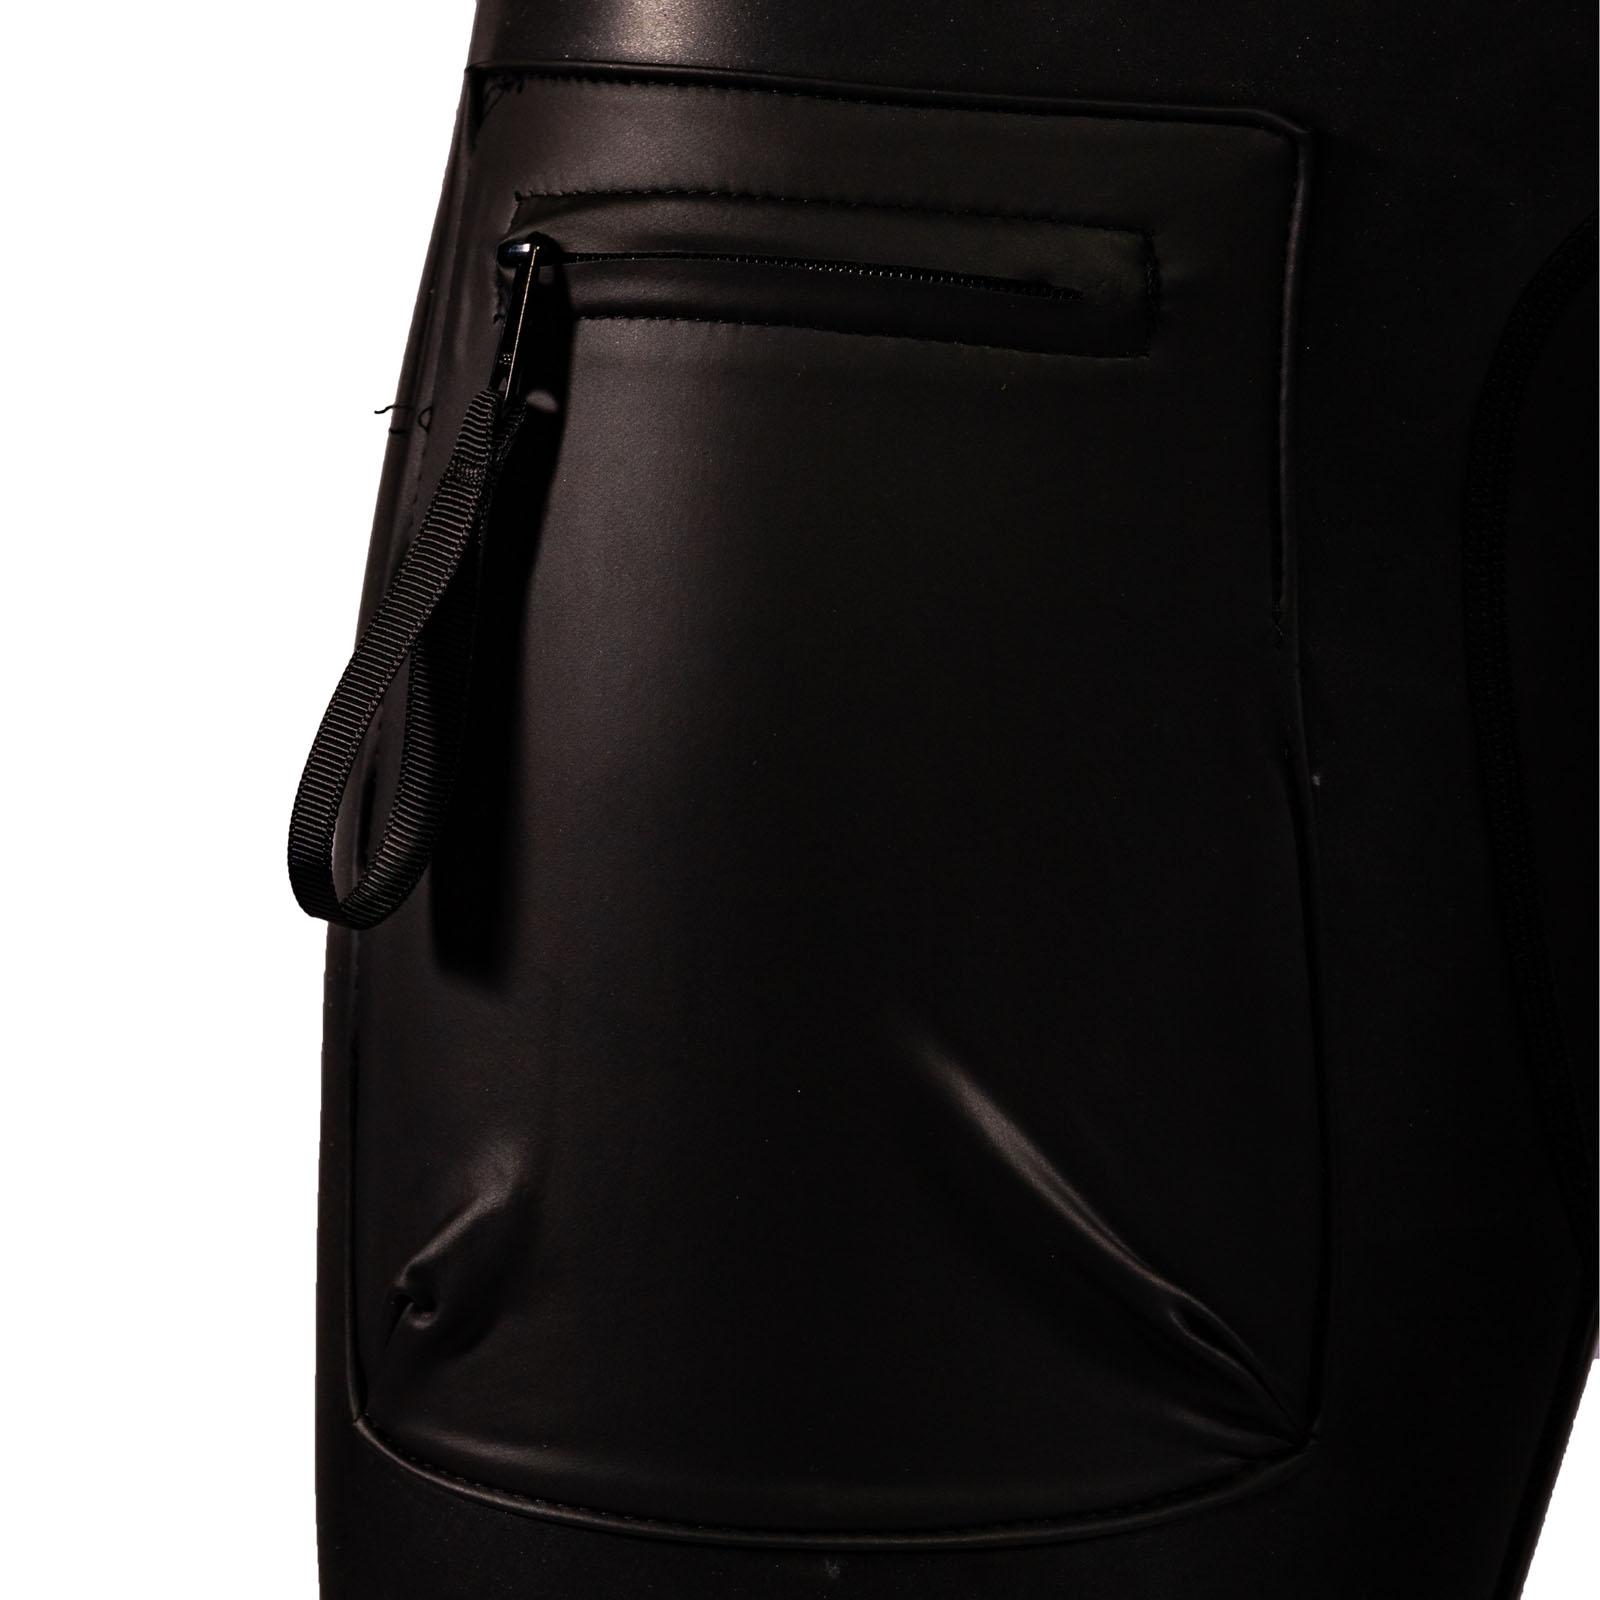 Yonda Spook Wetsuit - Men's Wetsuit